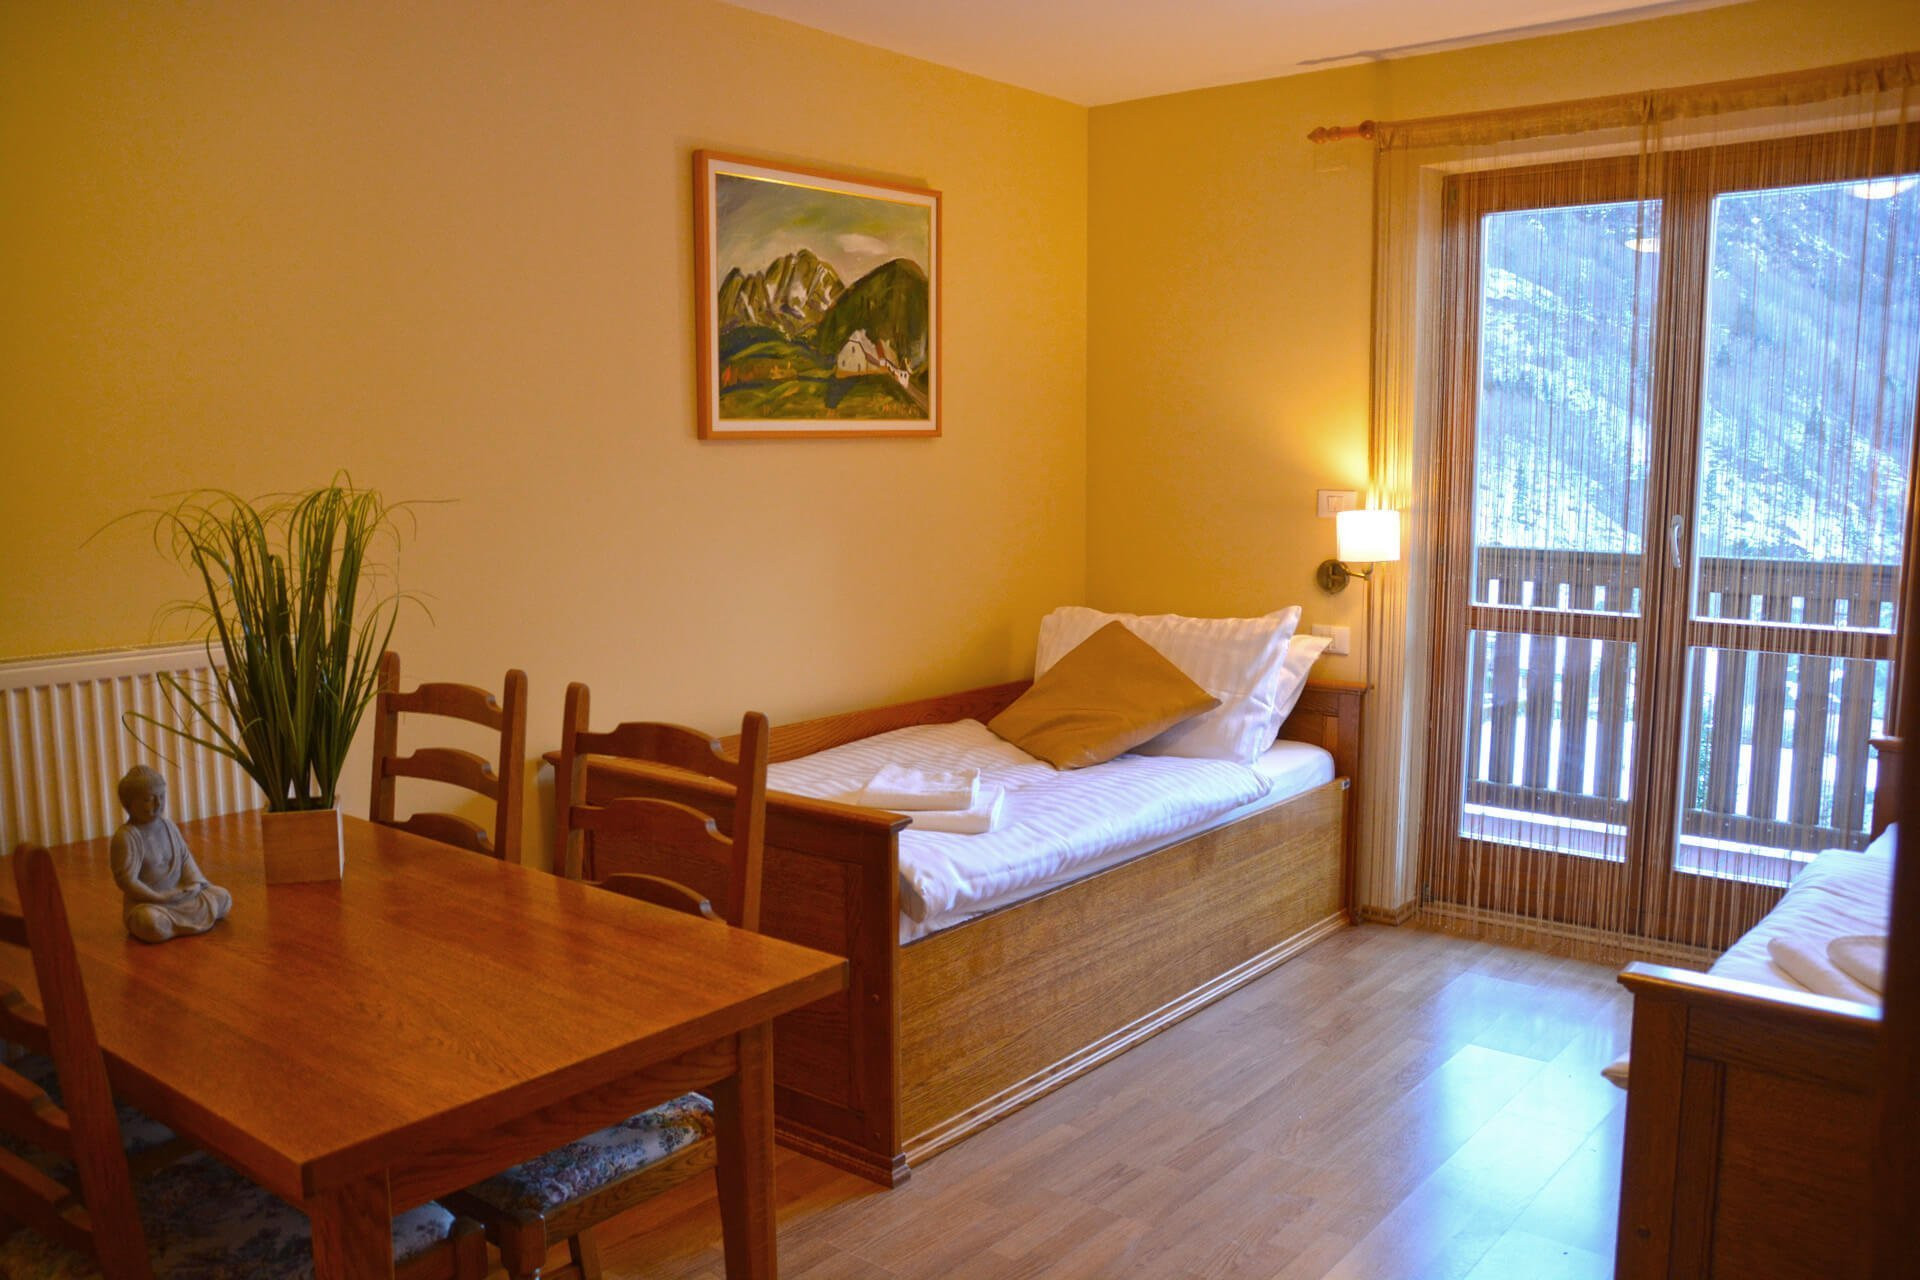 3* hotel in Slovenian Alps